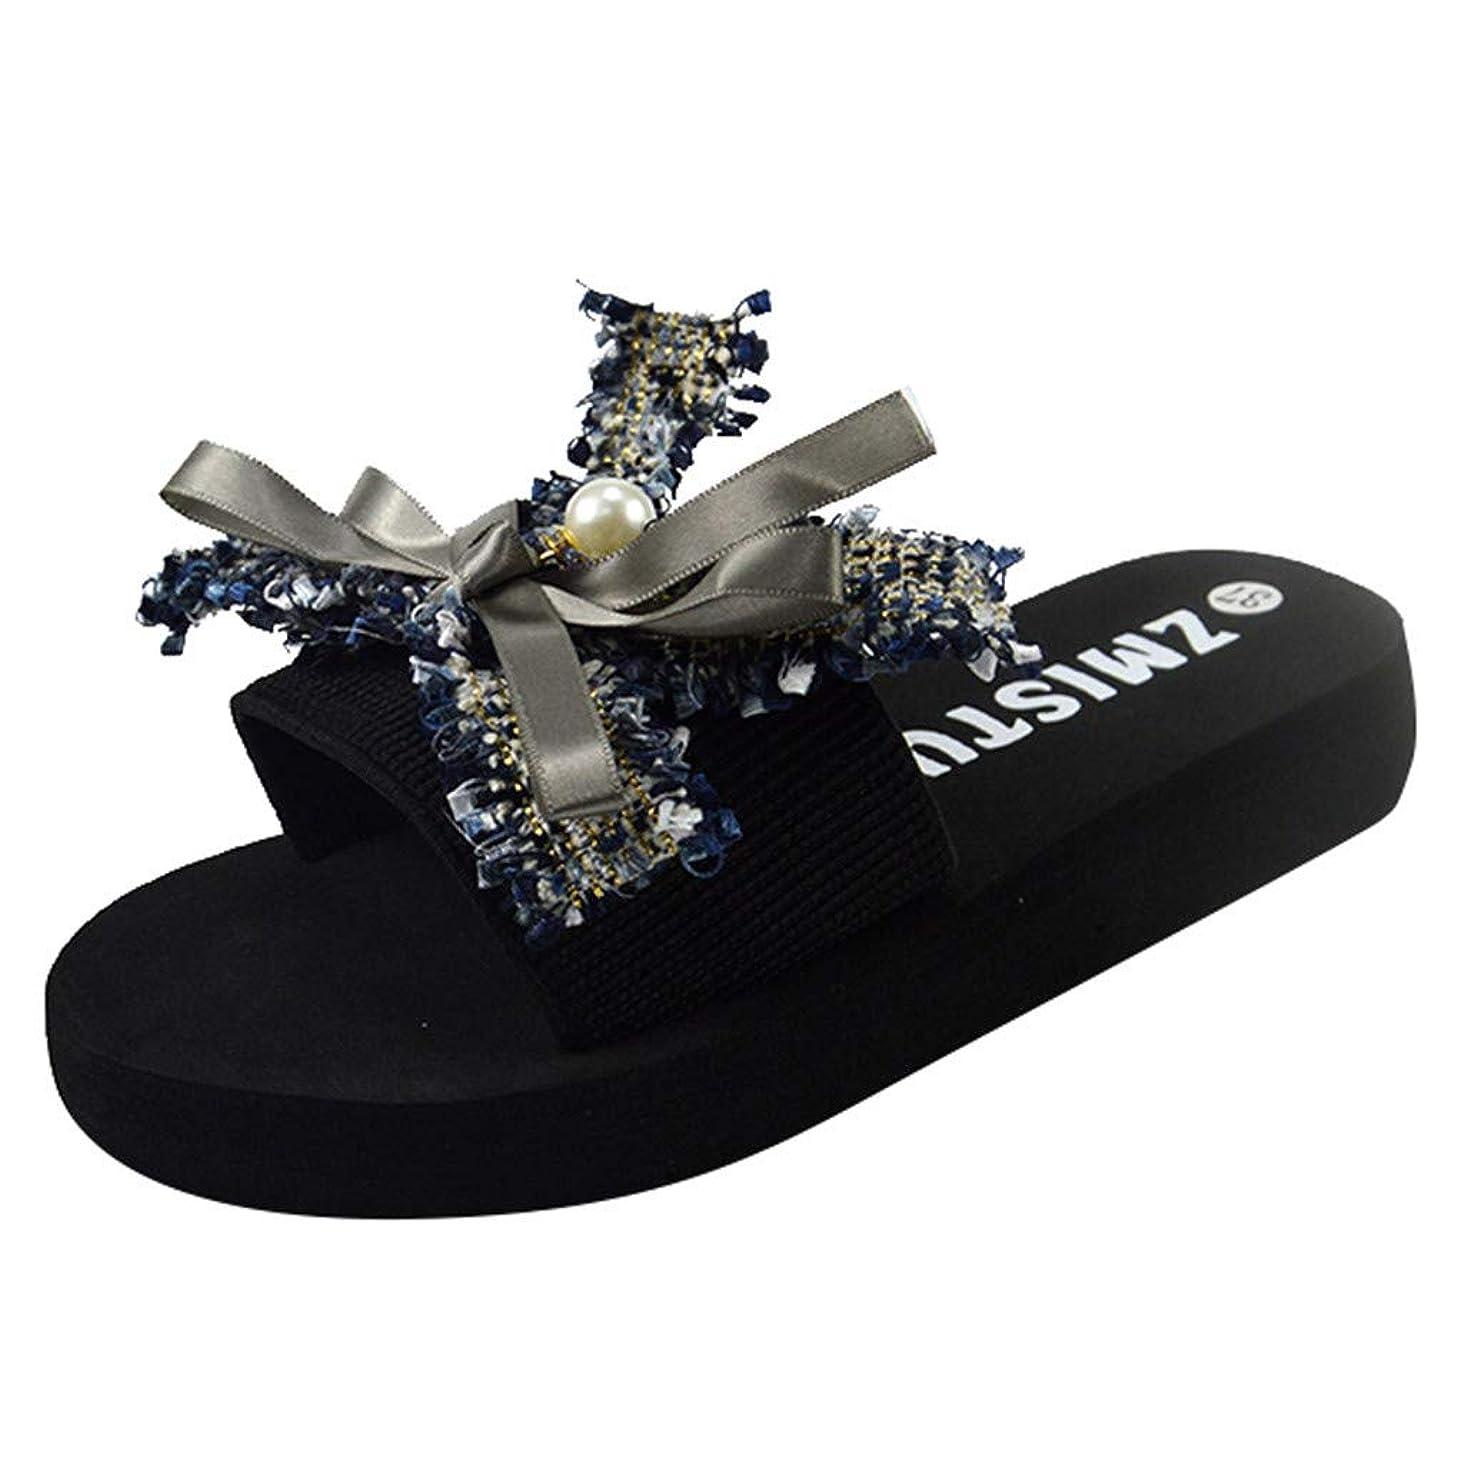 Londony?? Women Bow Flip-Flops Sandals Beach Flat Rain Jelly Shoes Bohemia Floral Print Sandals Slippers Shoes Gray